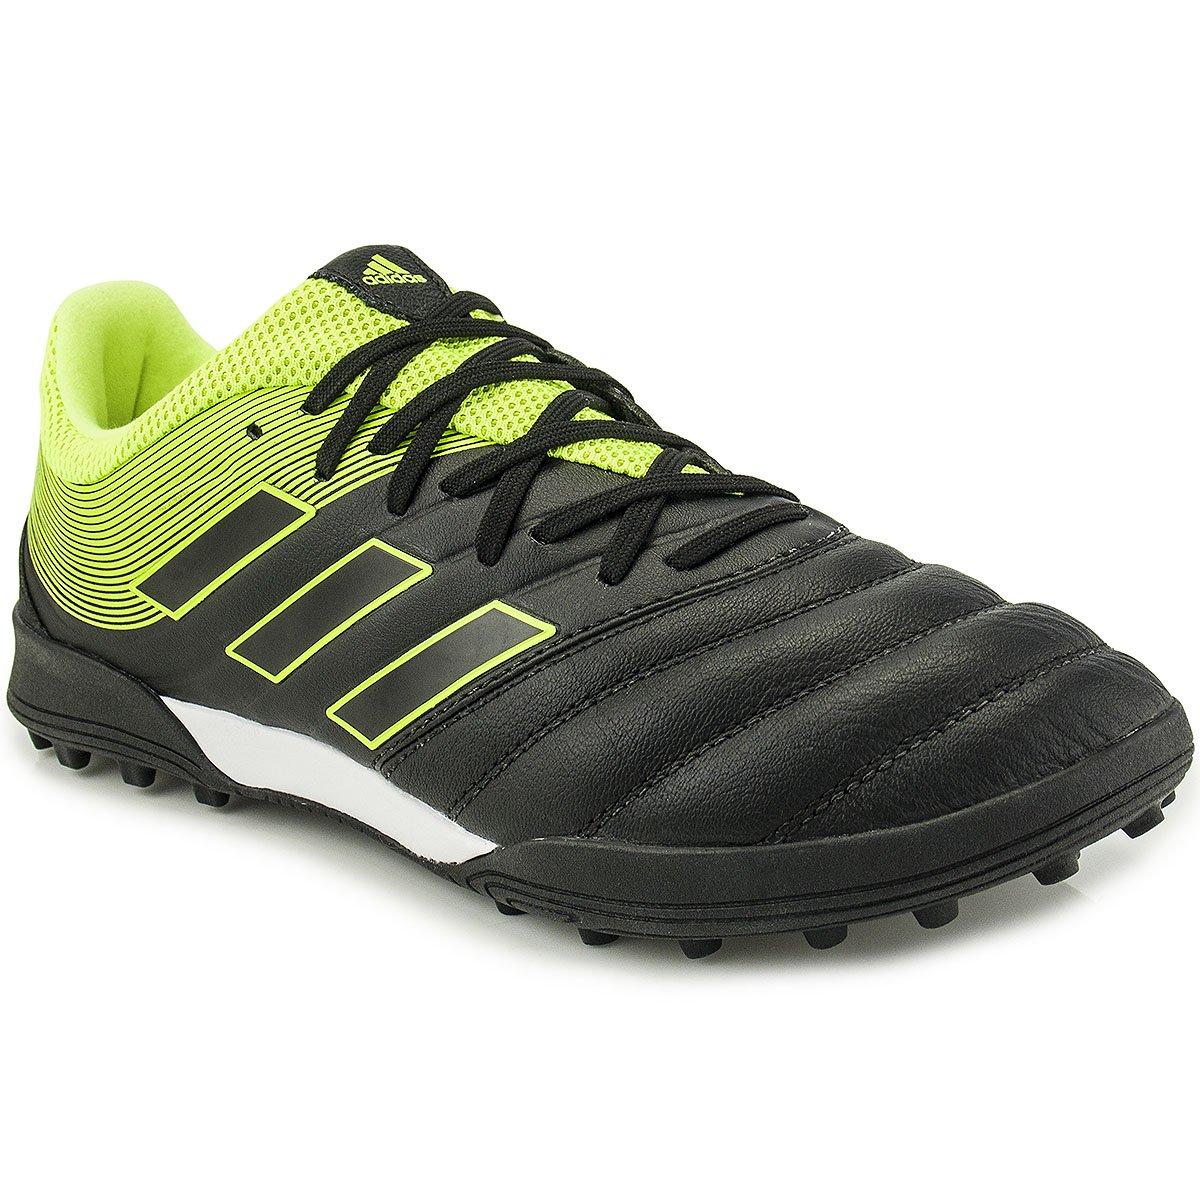 ee20705ed4 Chuteira Adidas Copa 19.3 TF